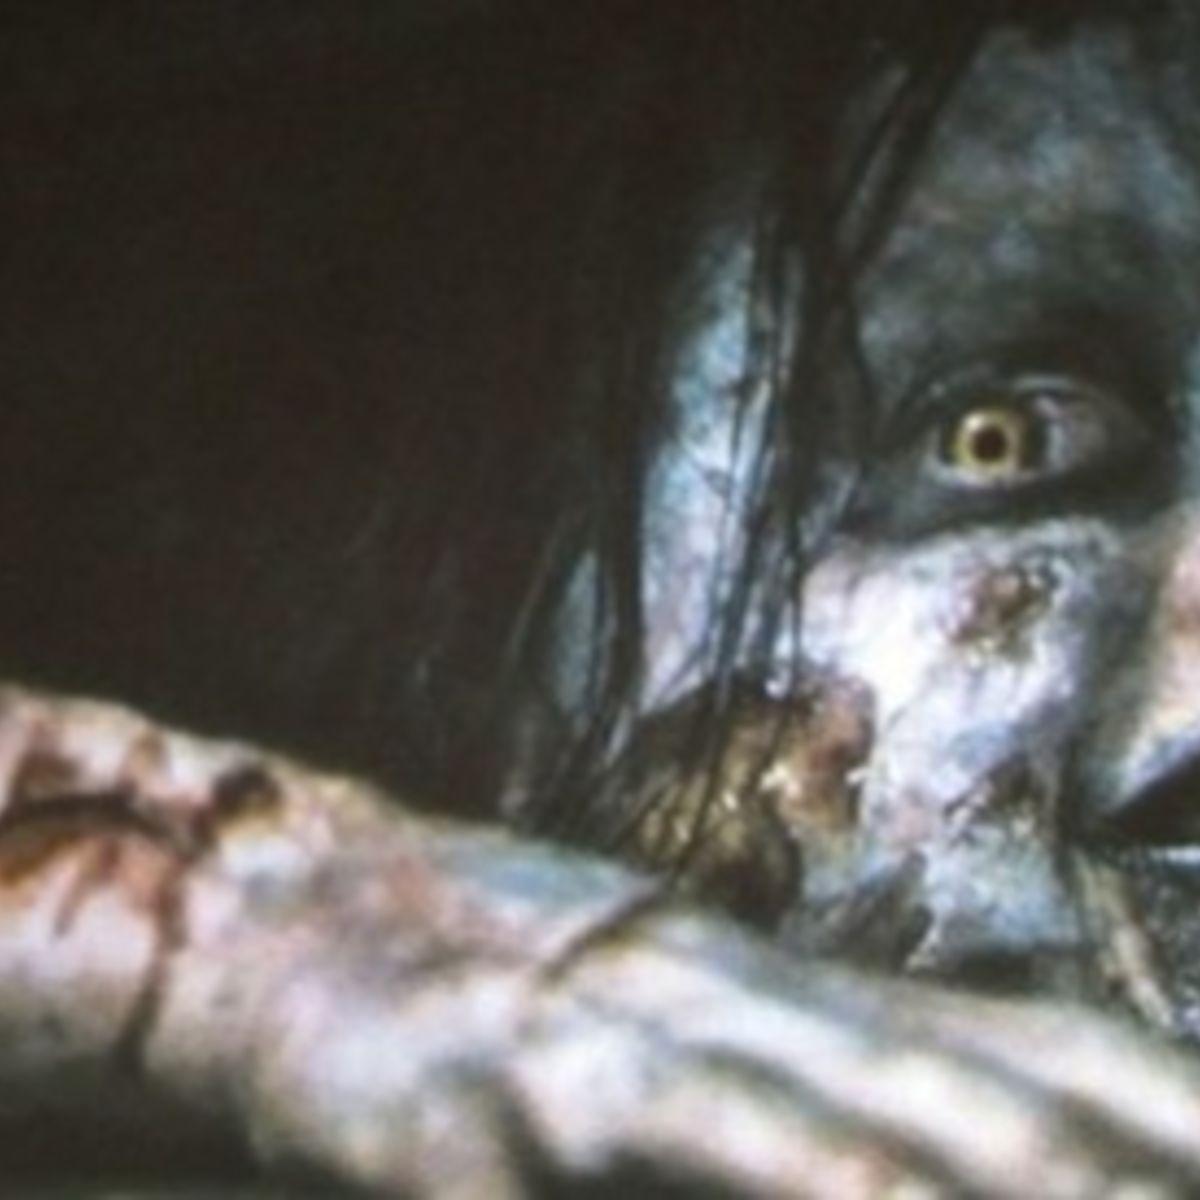 evil-dead-remake-650x325_0.jpeg